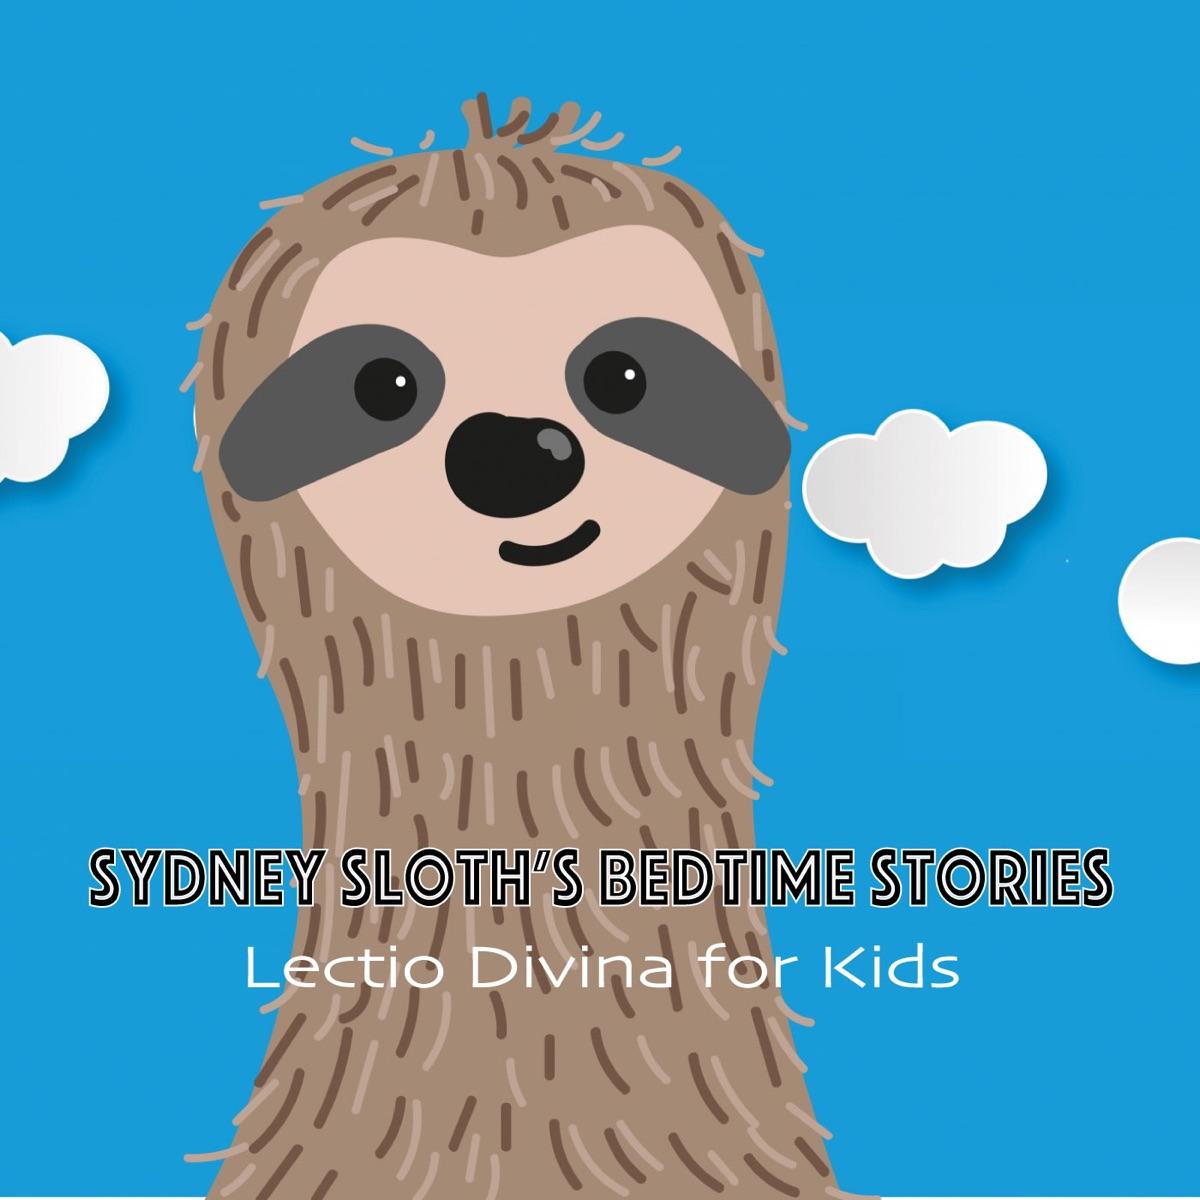 Sydney Sloth's Bedtime Stories (Lectio Divina for Kids)